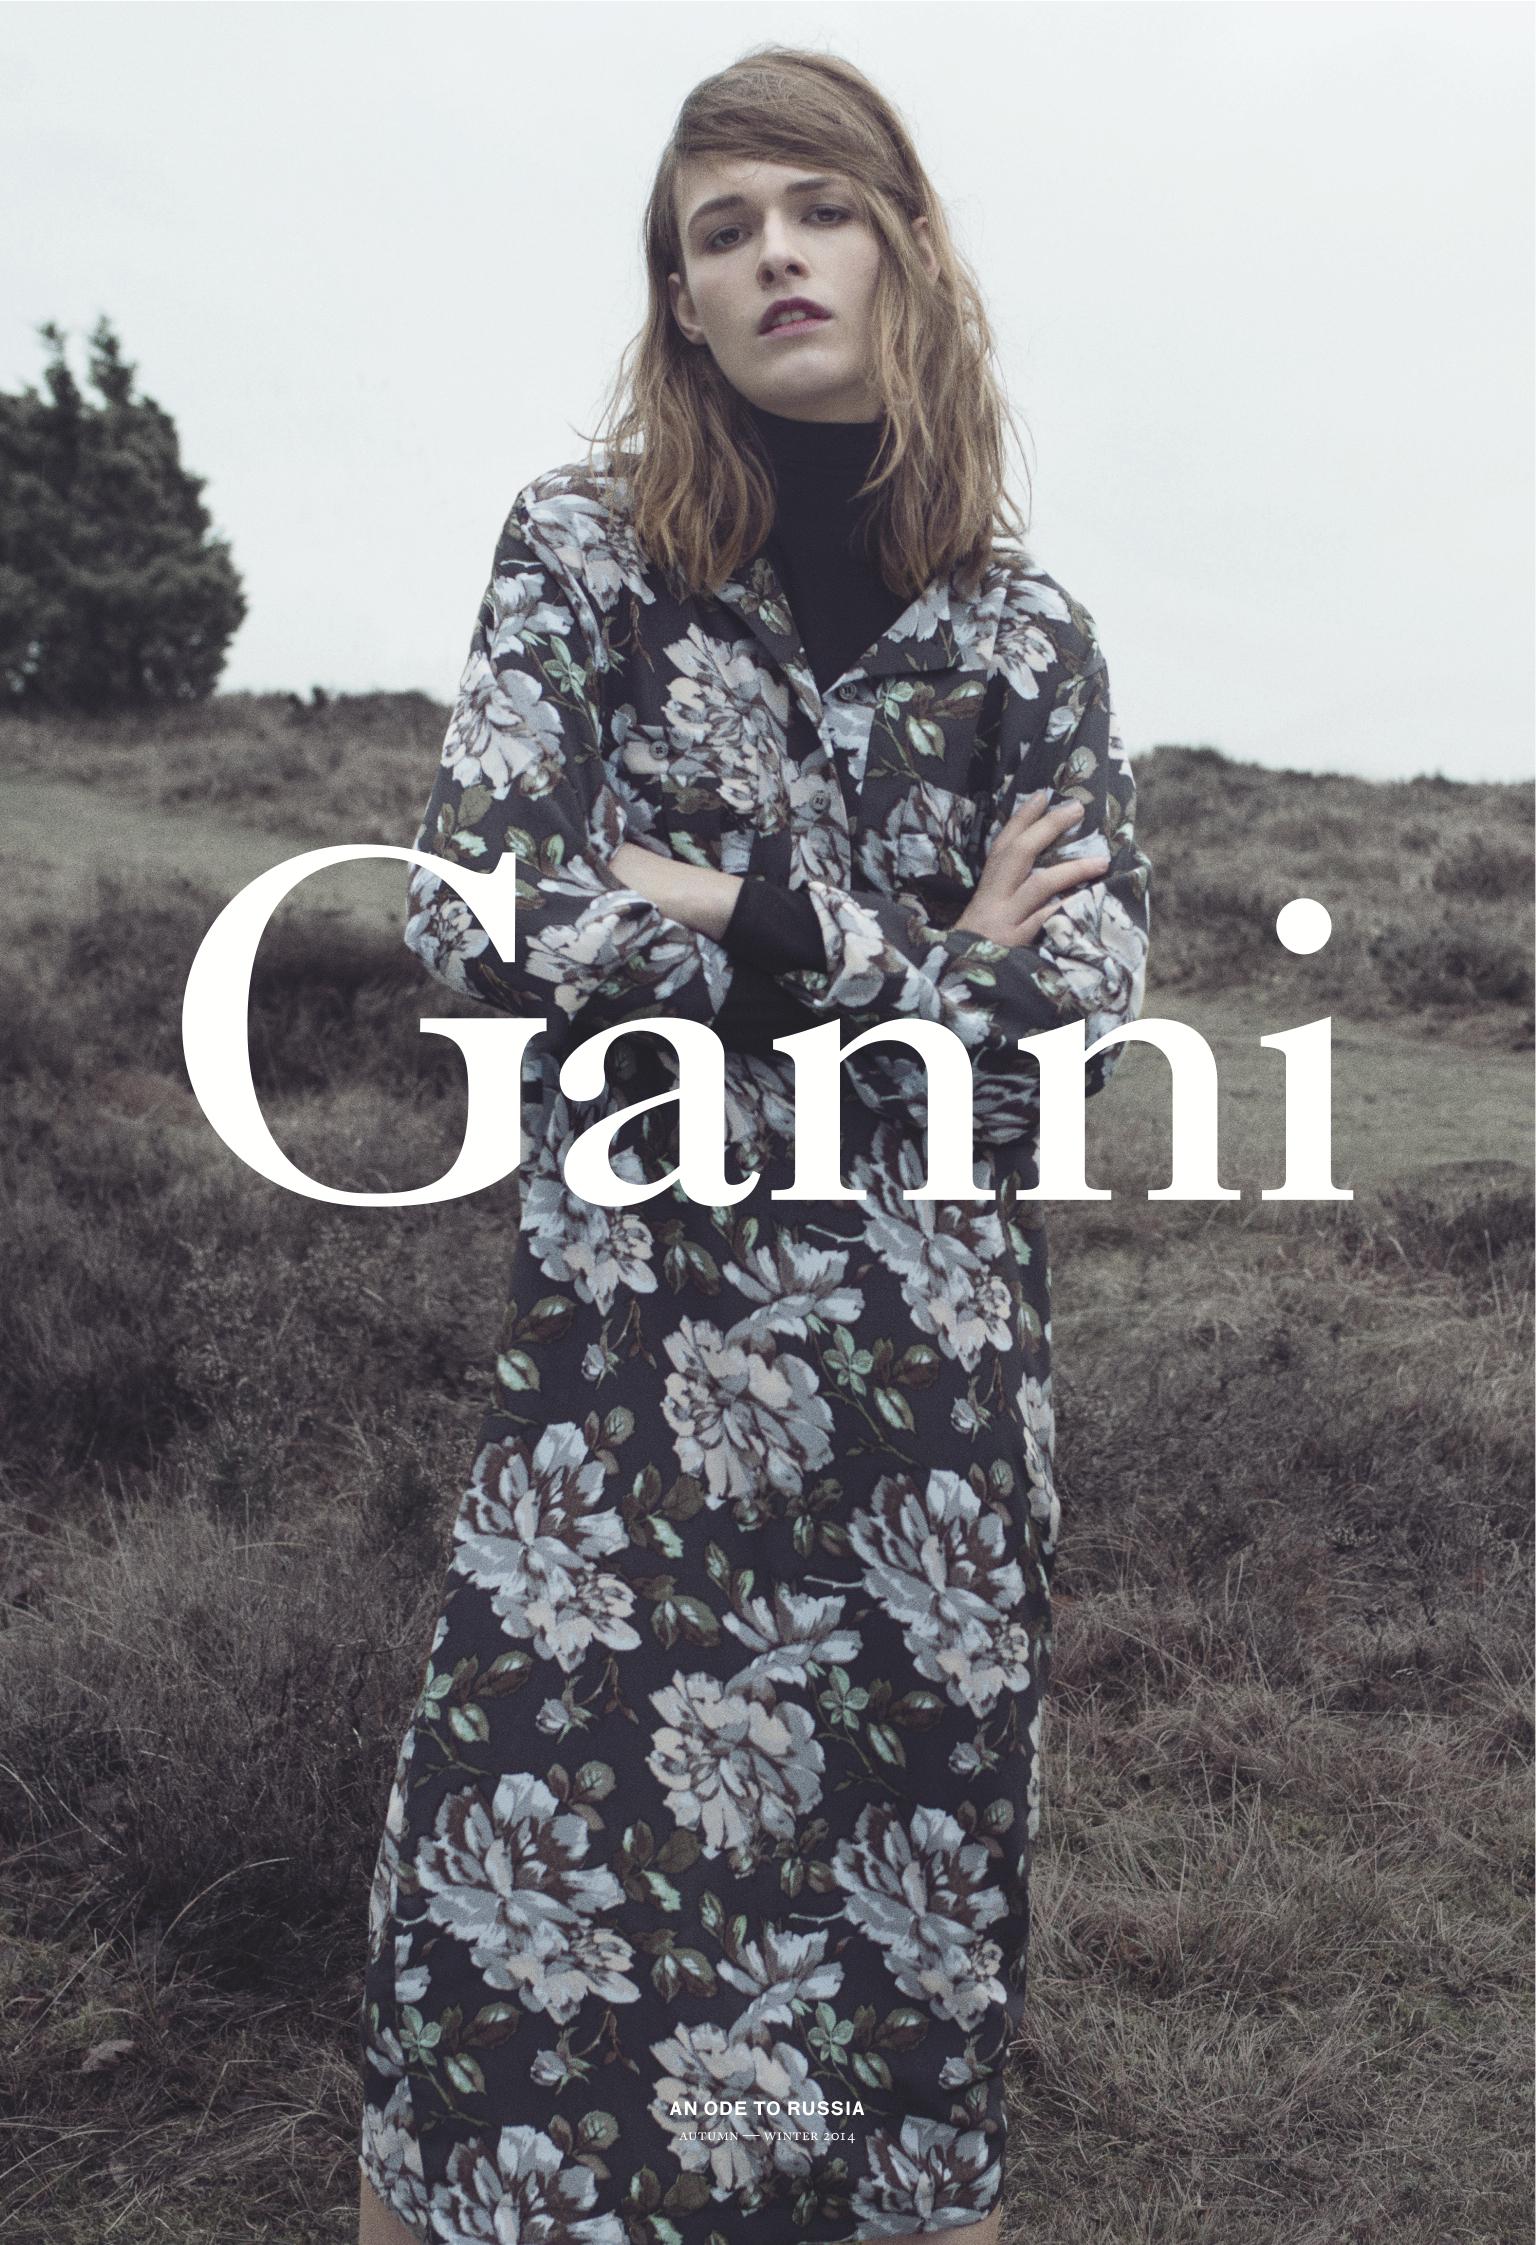 Ganni_ImageBook_AW14_Agentur2